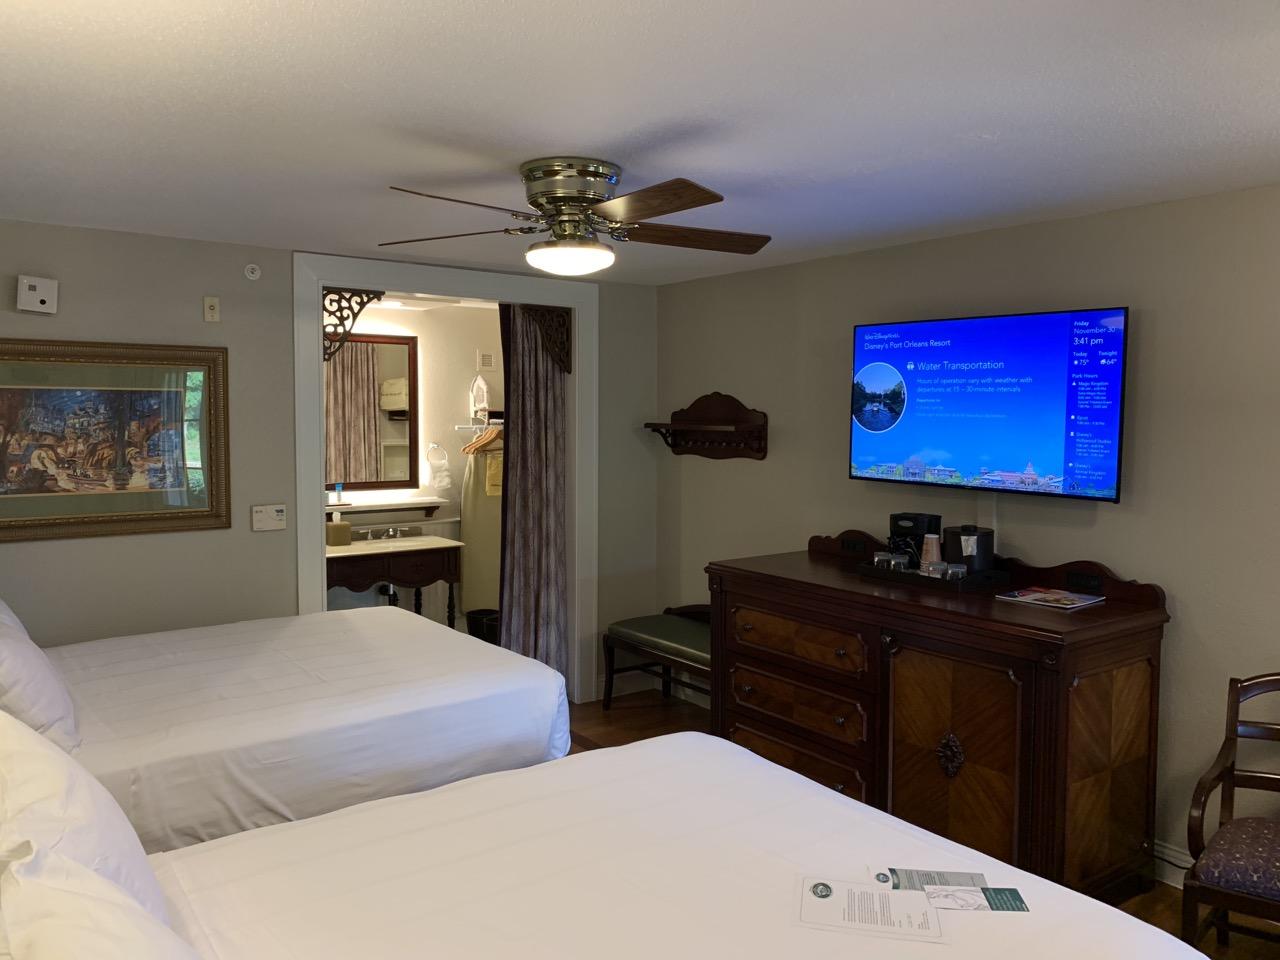 disney world best moderate resorts rankings 05 french quarter room.jpeg